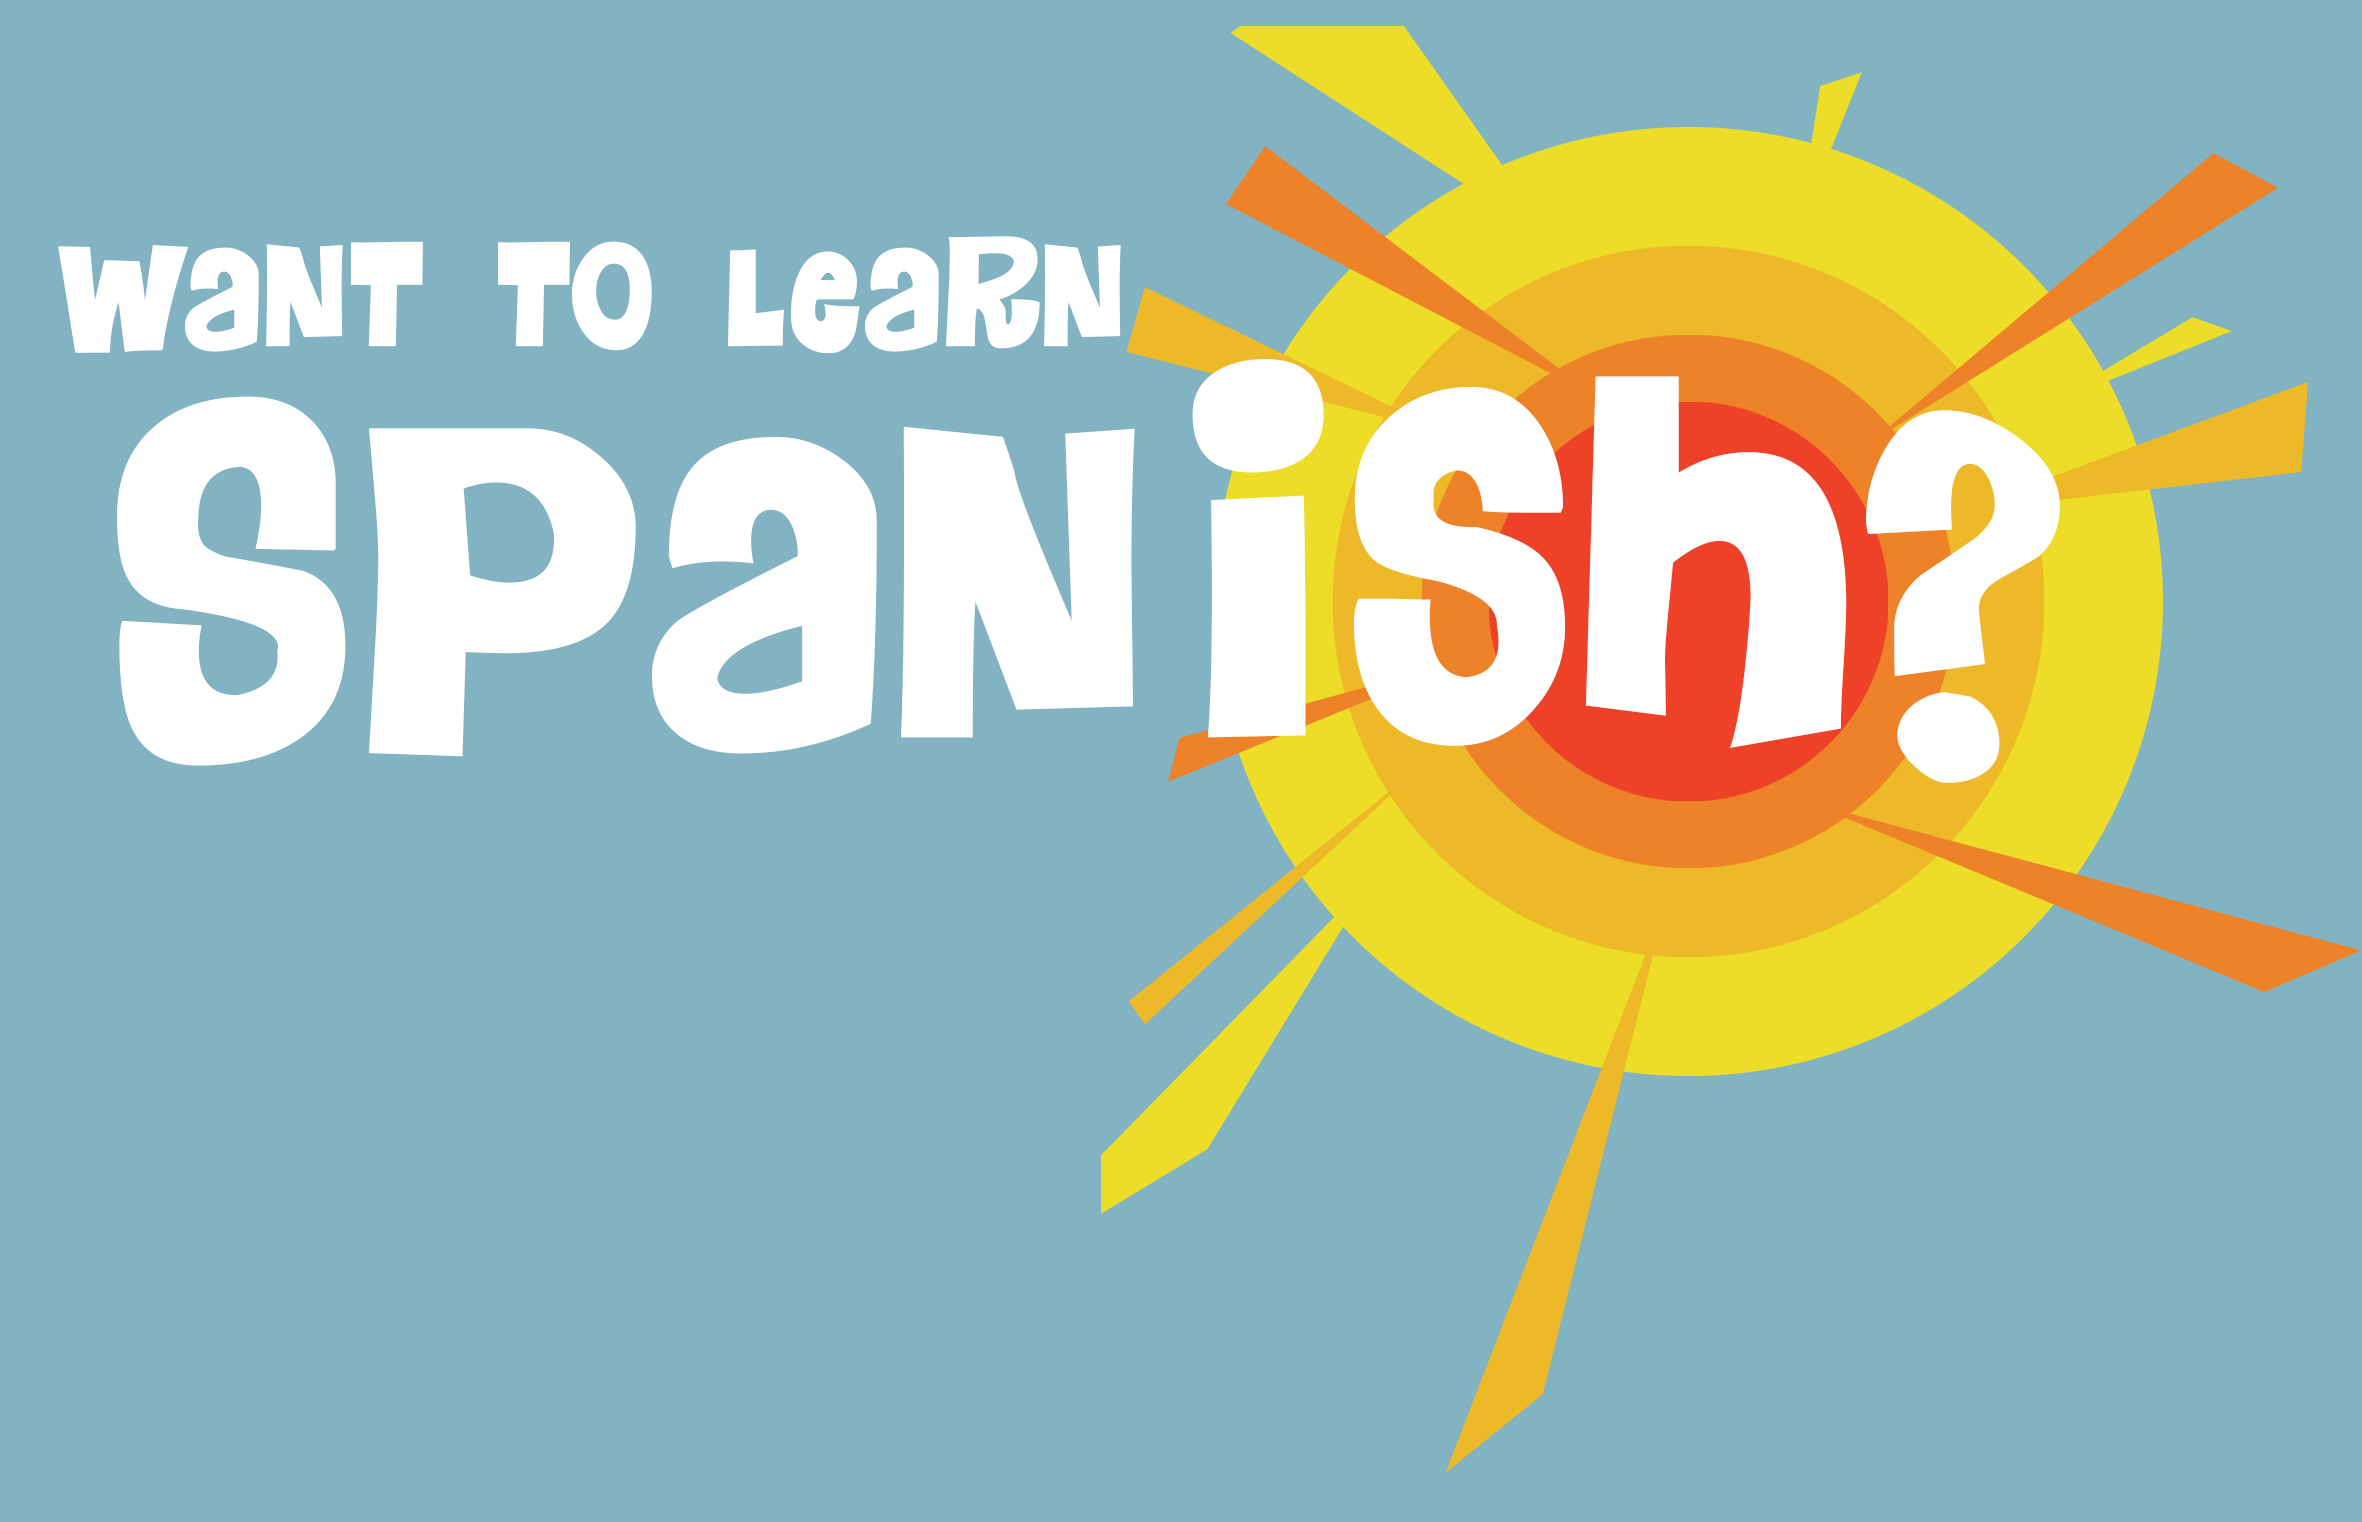 SPANISH TUTORING SERVICES